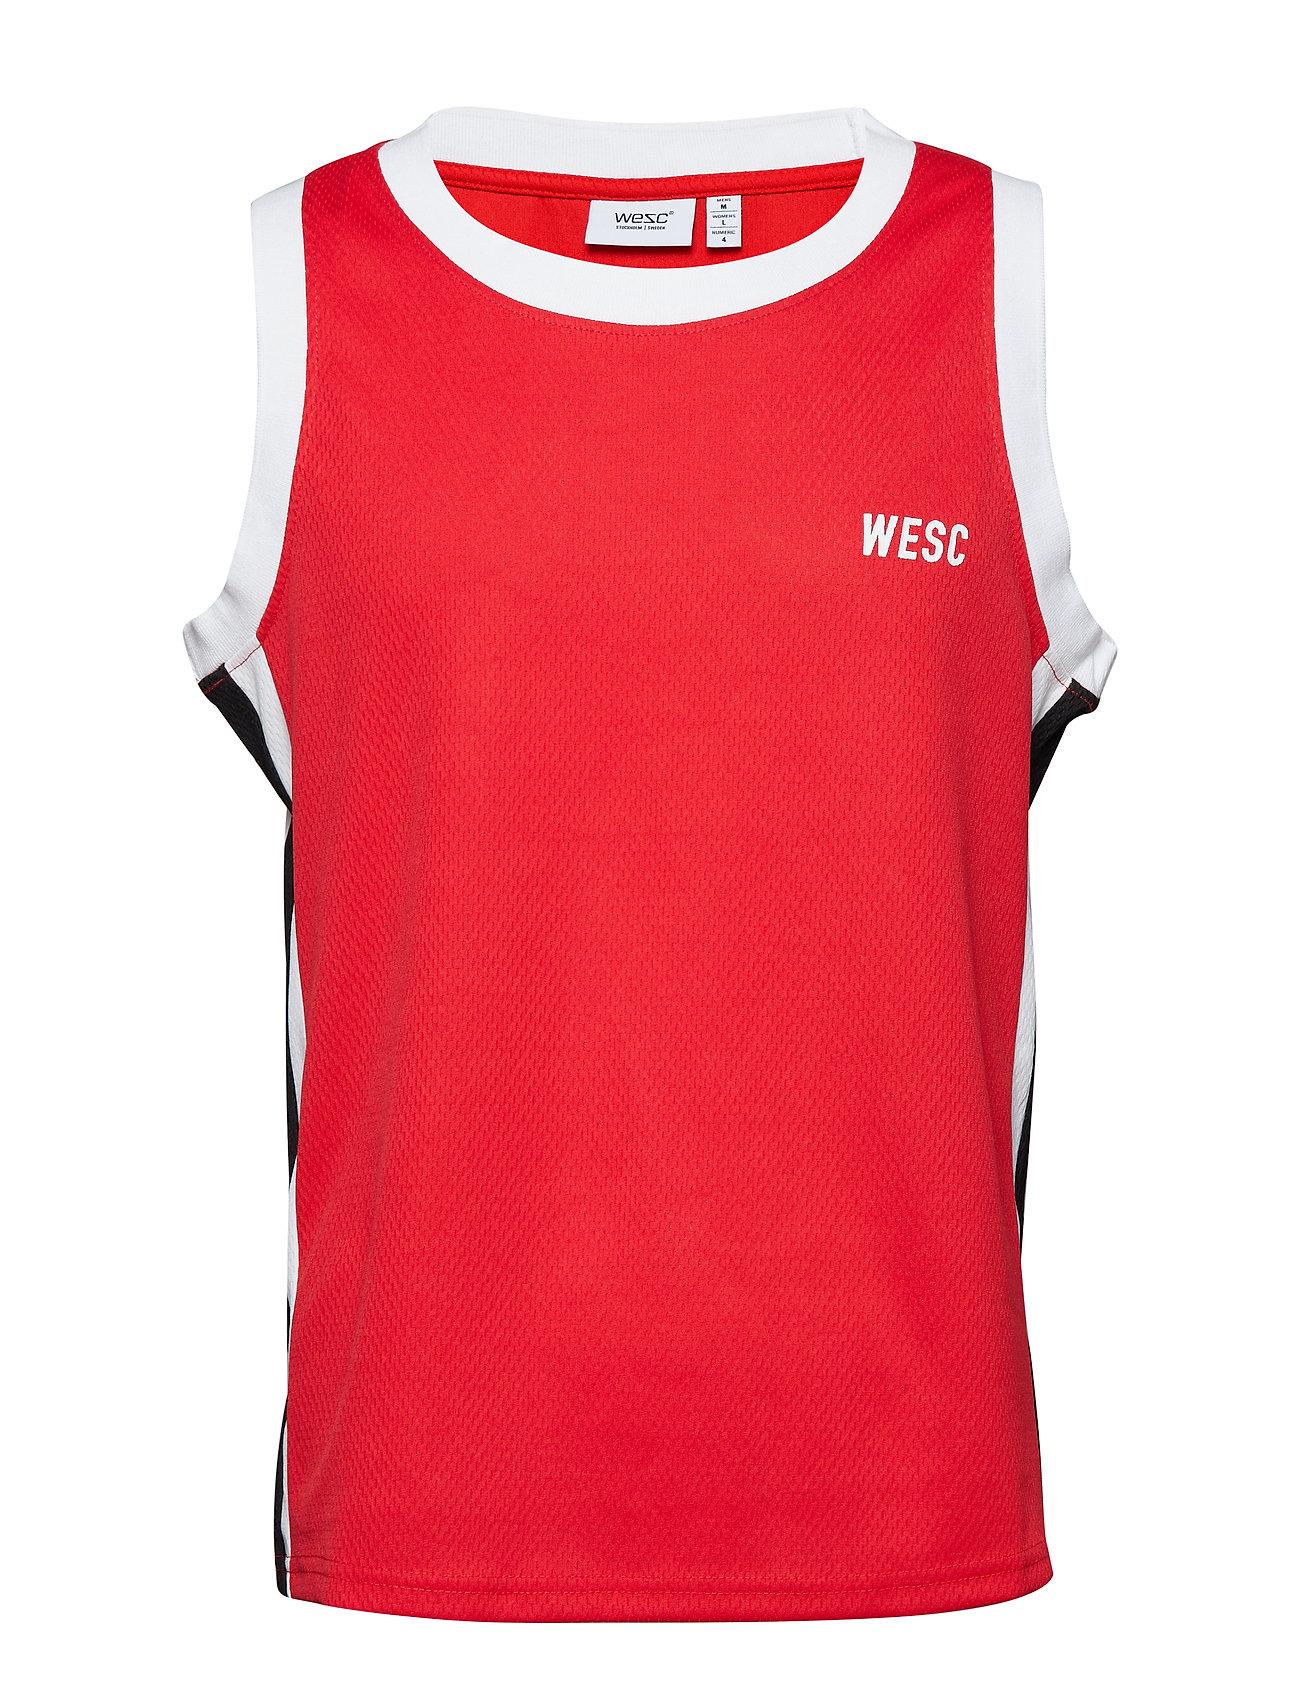 WeSC B-BALL TANK - BLOOD RED